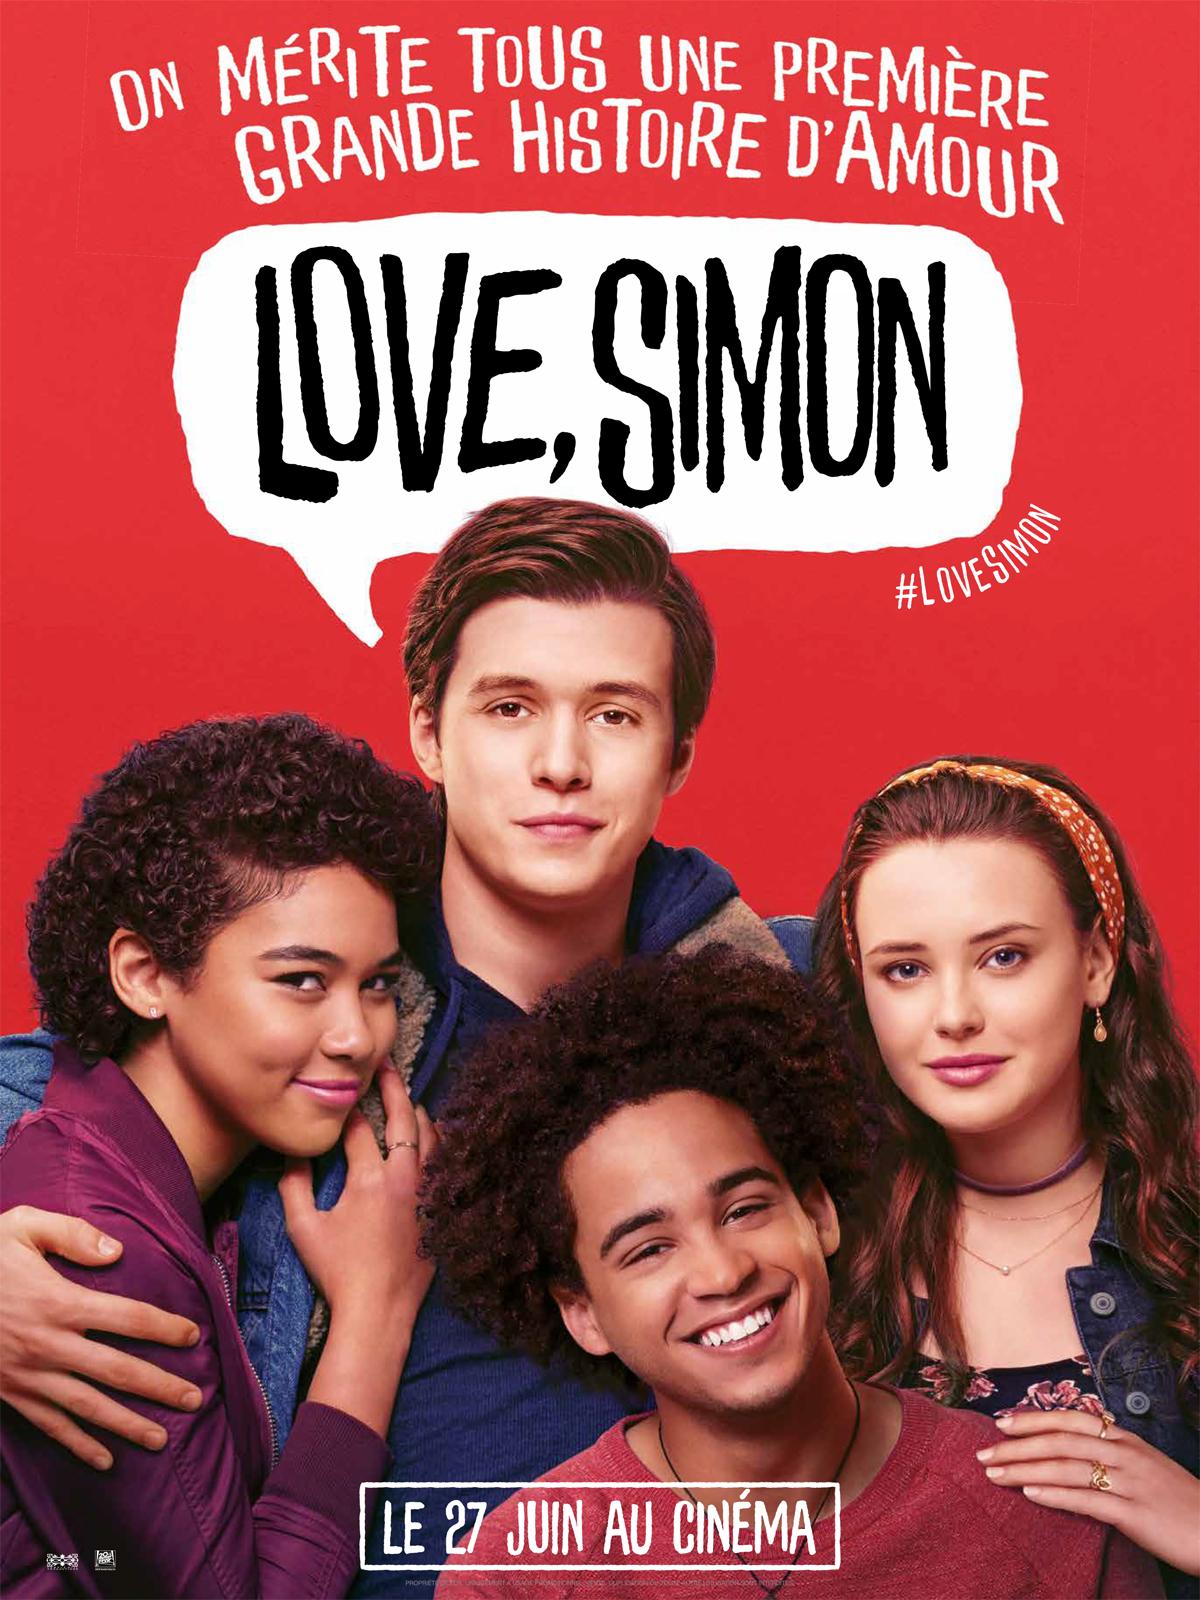 Odonnell love simon sean Love, Simon